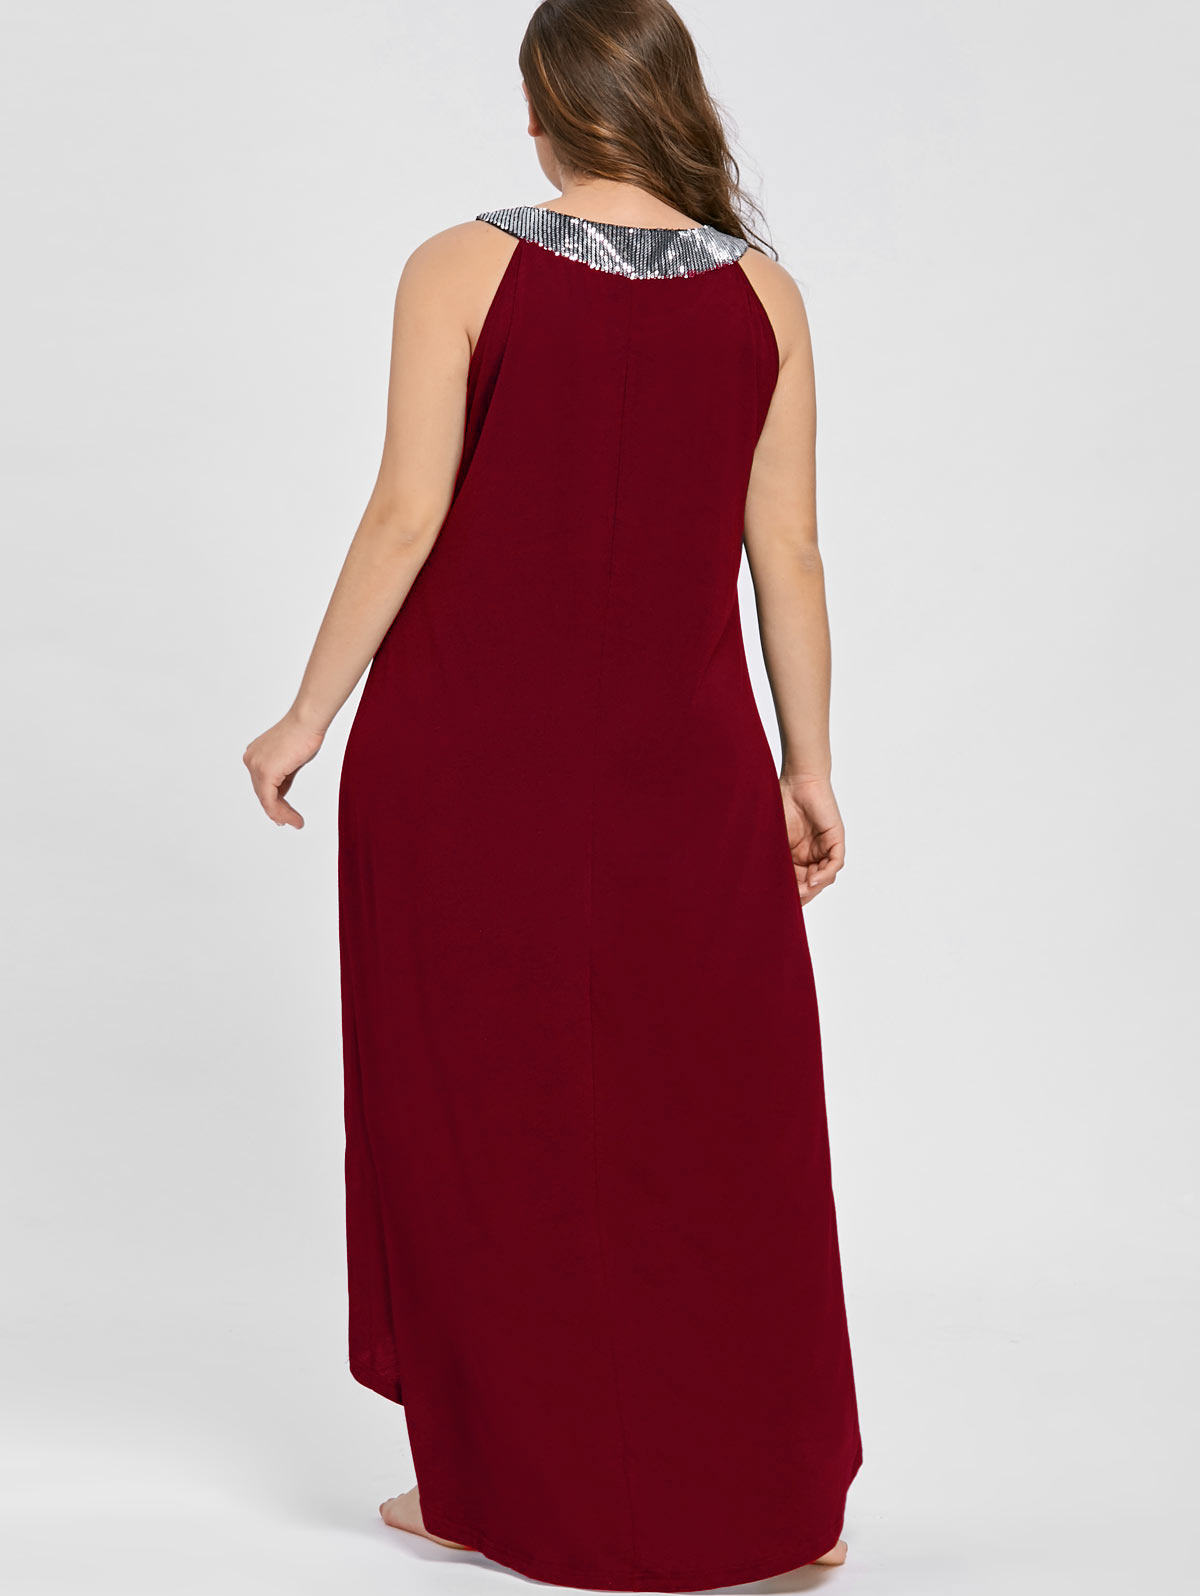 071b8aba5fed Silhouette: Asymmetrical Dresses Length: Floor-Length Neckline: Round  Collar Sleeve Length: Sleeveless Waist: Natural Embellishment: Sequins